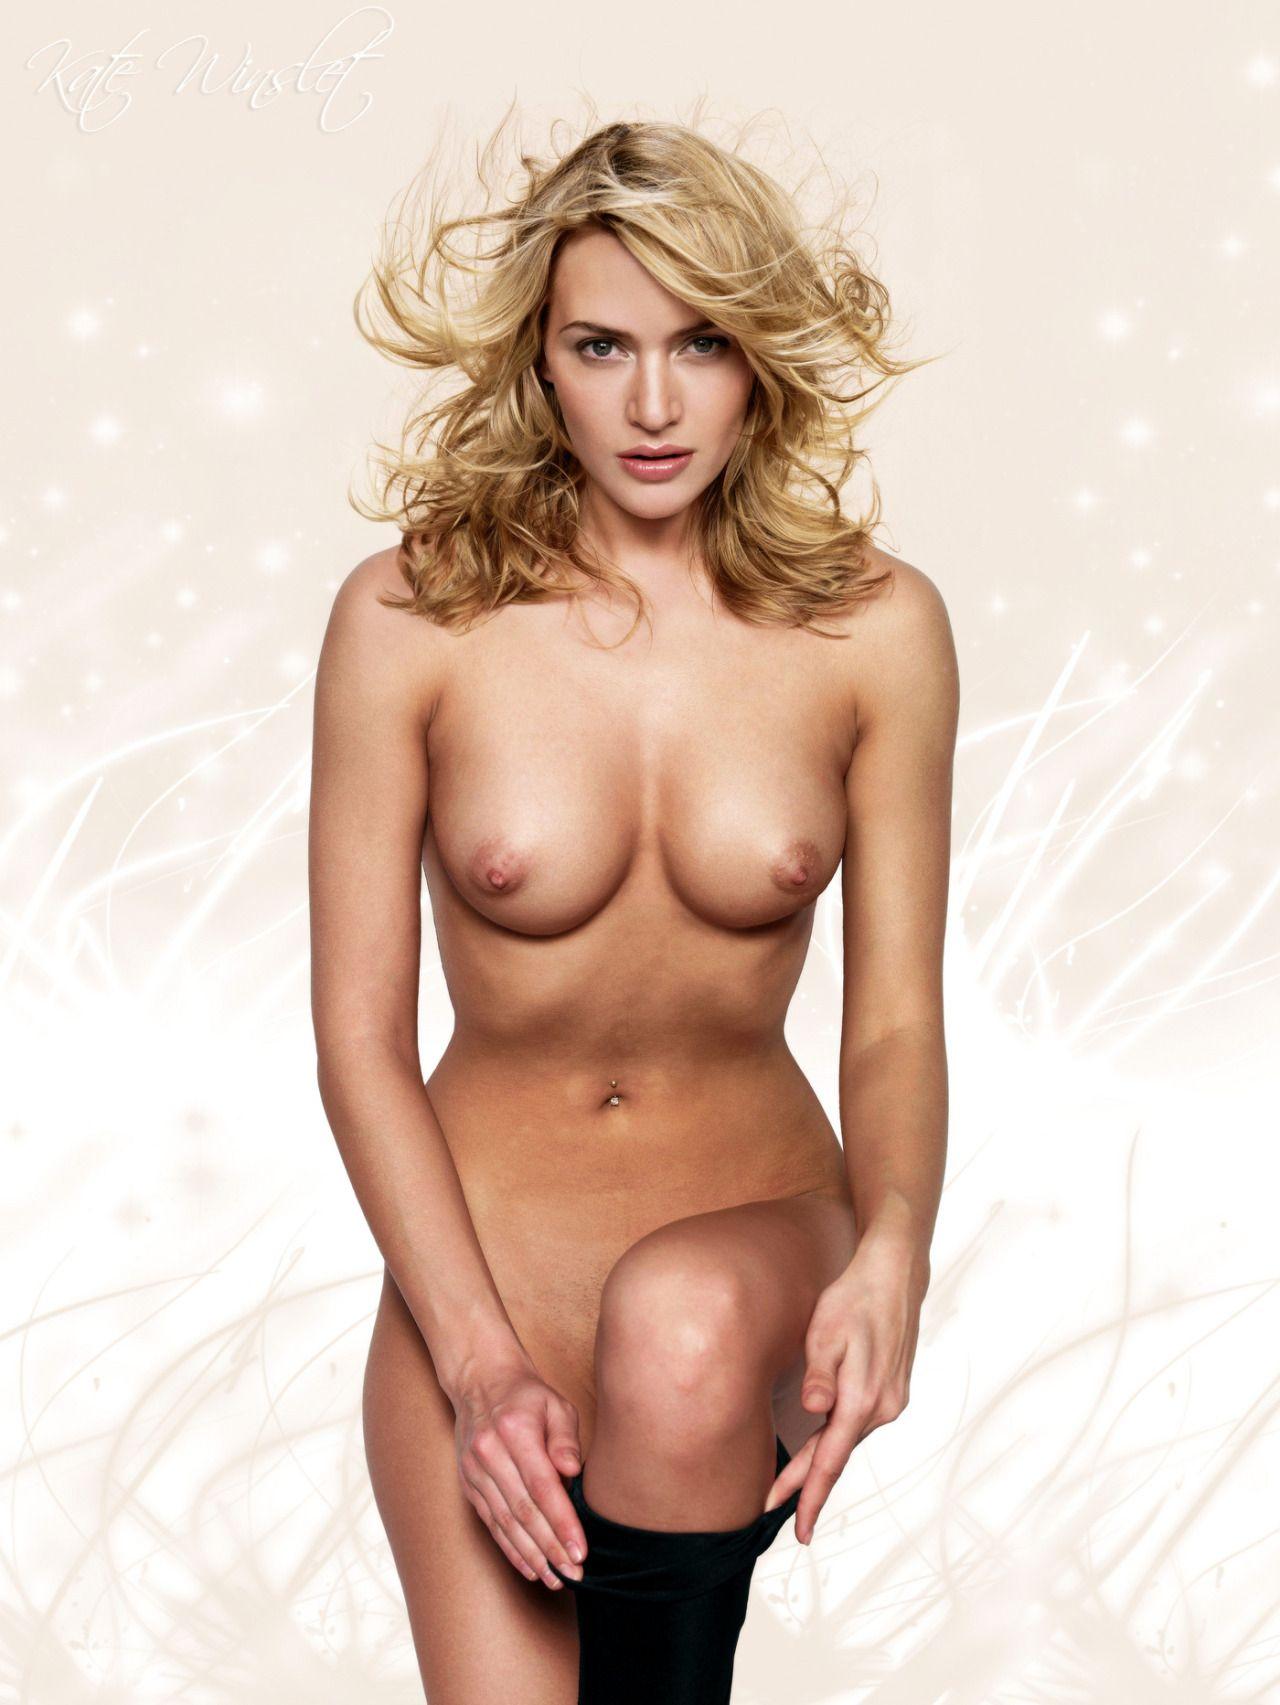 Virus Fri Porno Sexy Jente